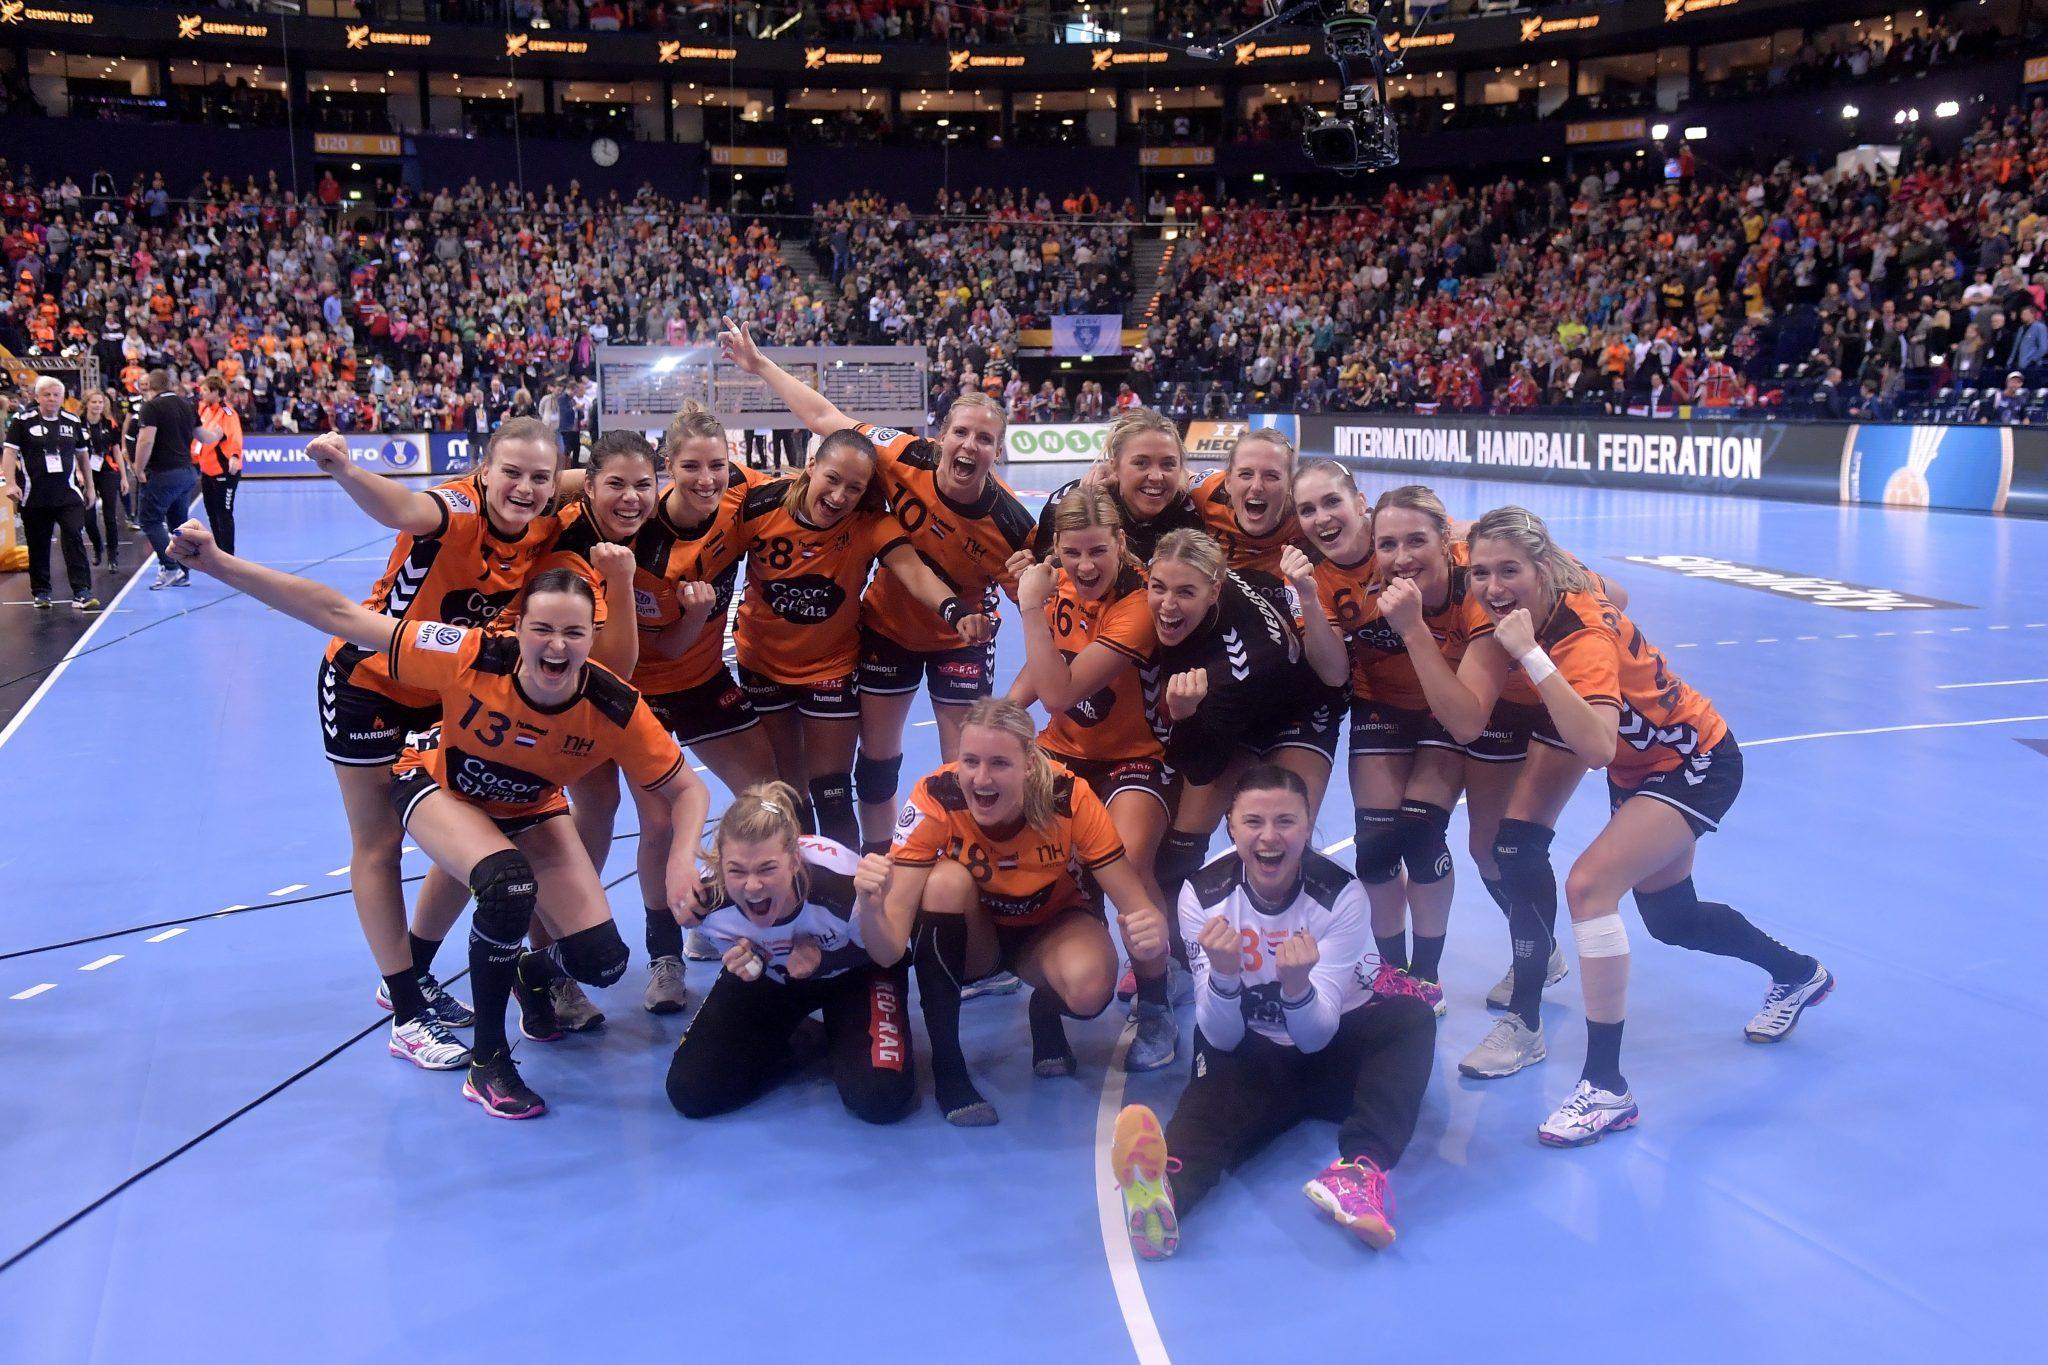 17-12-2017 HANDBAL:NEDERLAND-ZWEDEN:HAMBURG WK Handbal Dames 2017 3/4 Plaats, Nederland-Zweden 24-21 Nederland Wint De Bronzen Medaille De Overwinningsfoto  Foto: Henk Seppen